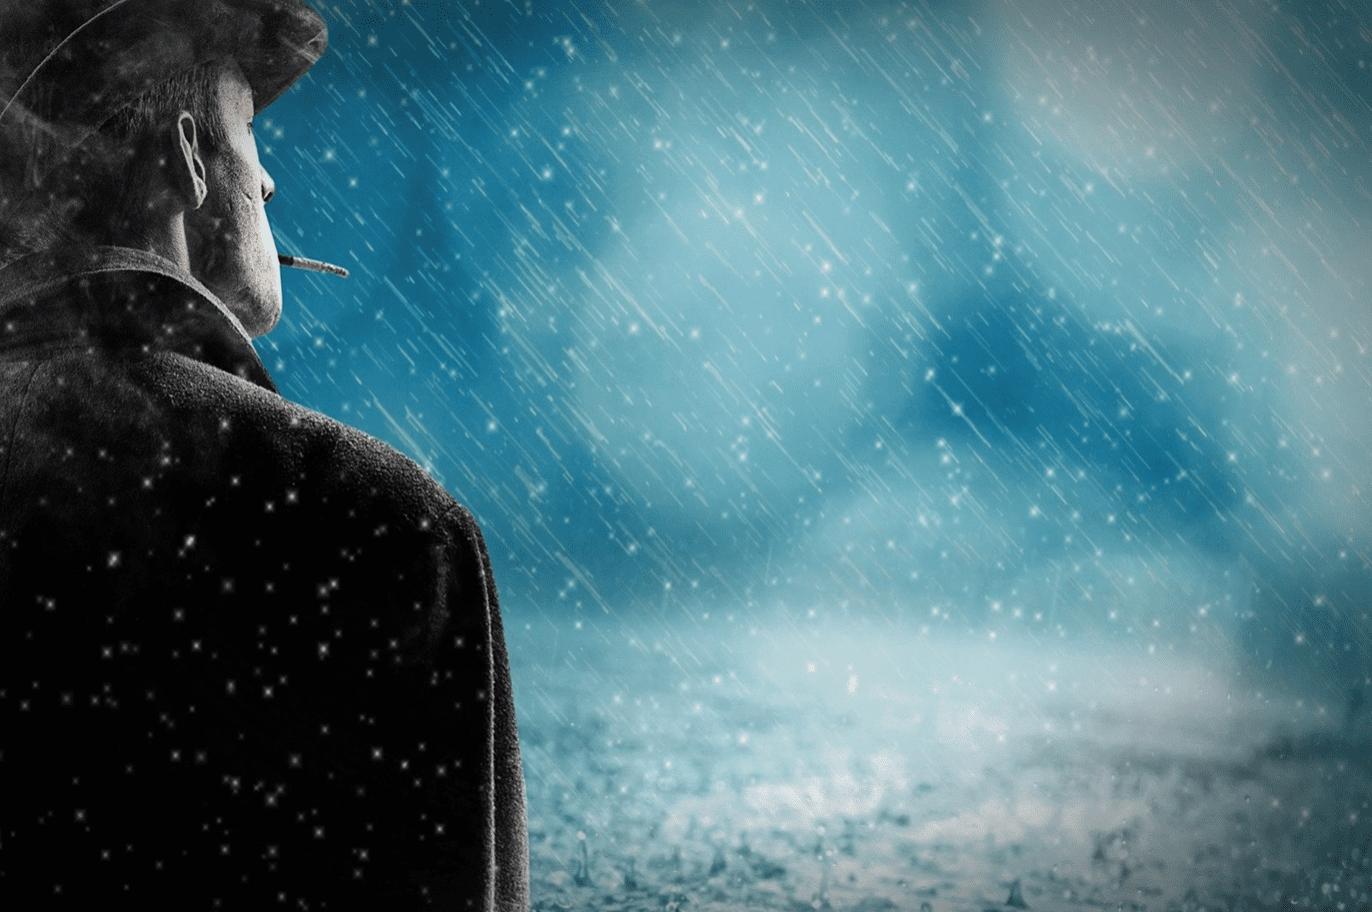 Man standing smoking a cigarette as snow falls; image by Pixel2013, via Pixabay.com.